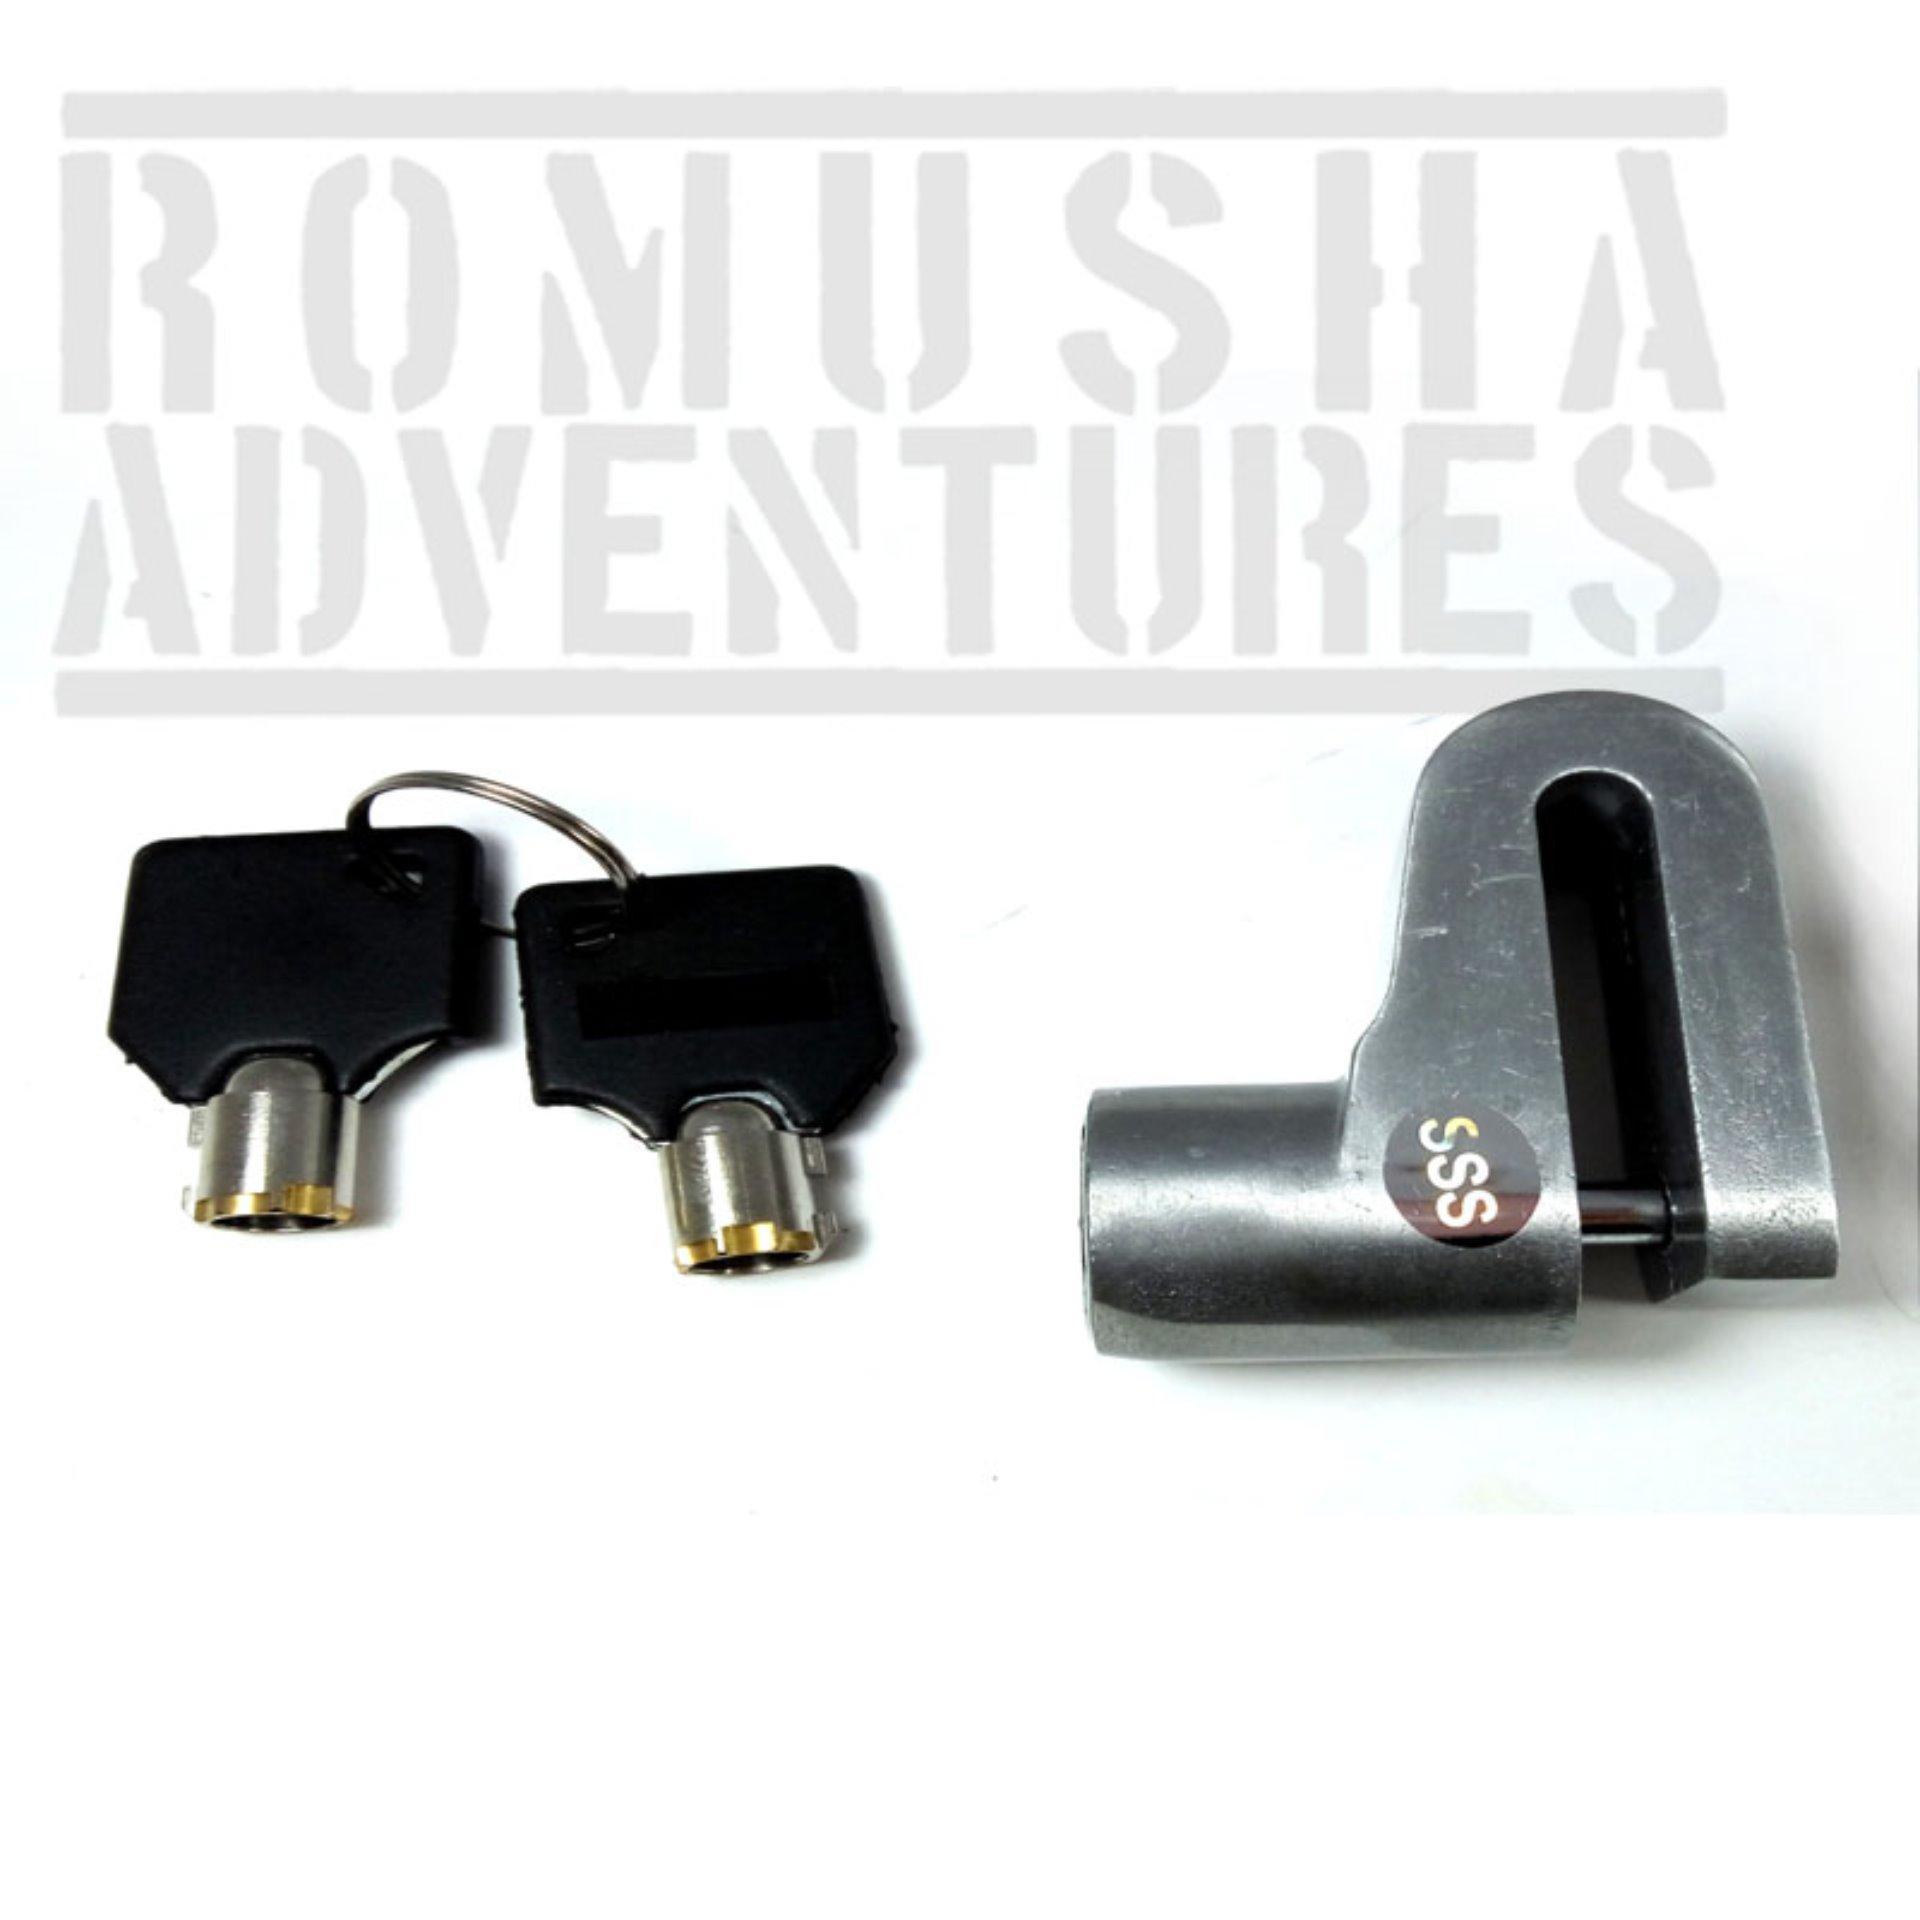 Harga Terendah Romusha Disc Brake Lock Kunci Gembok Cakram Motor Triangle Tdr